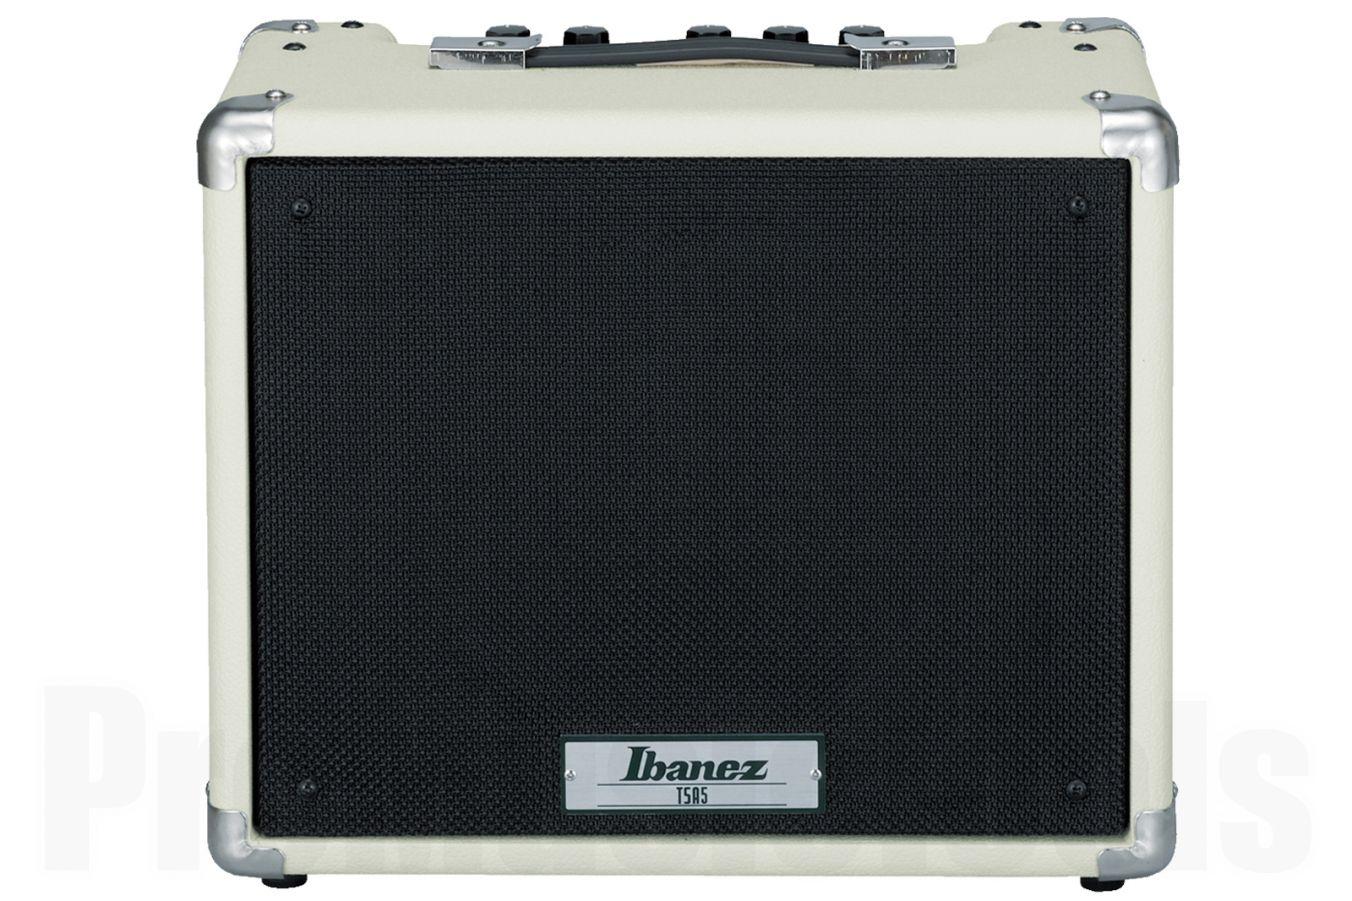 Ibanez TSA5 Tube Screamer Valve Amplifier - demo